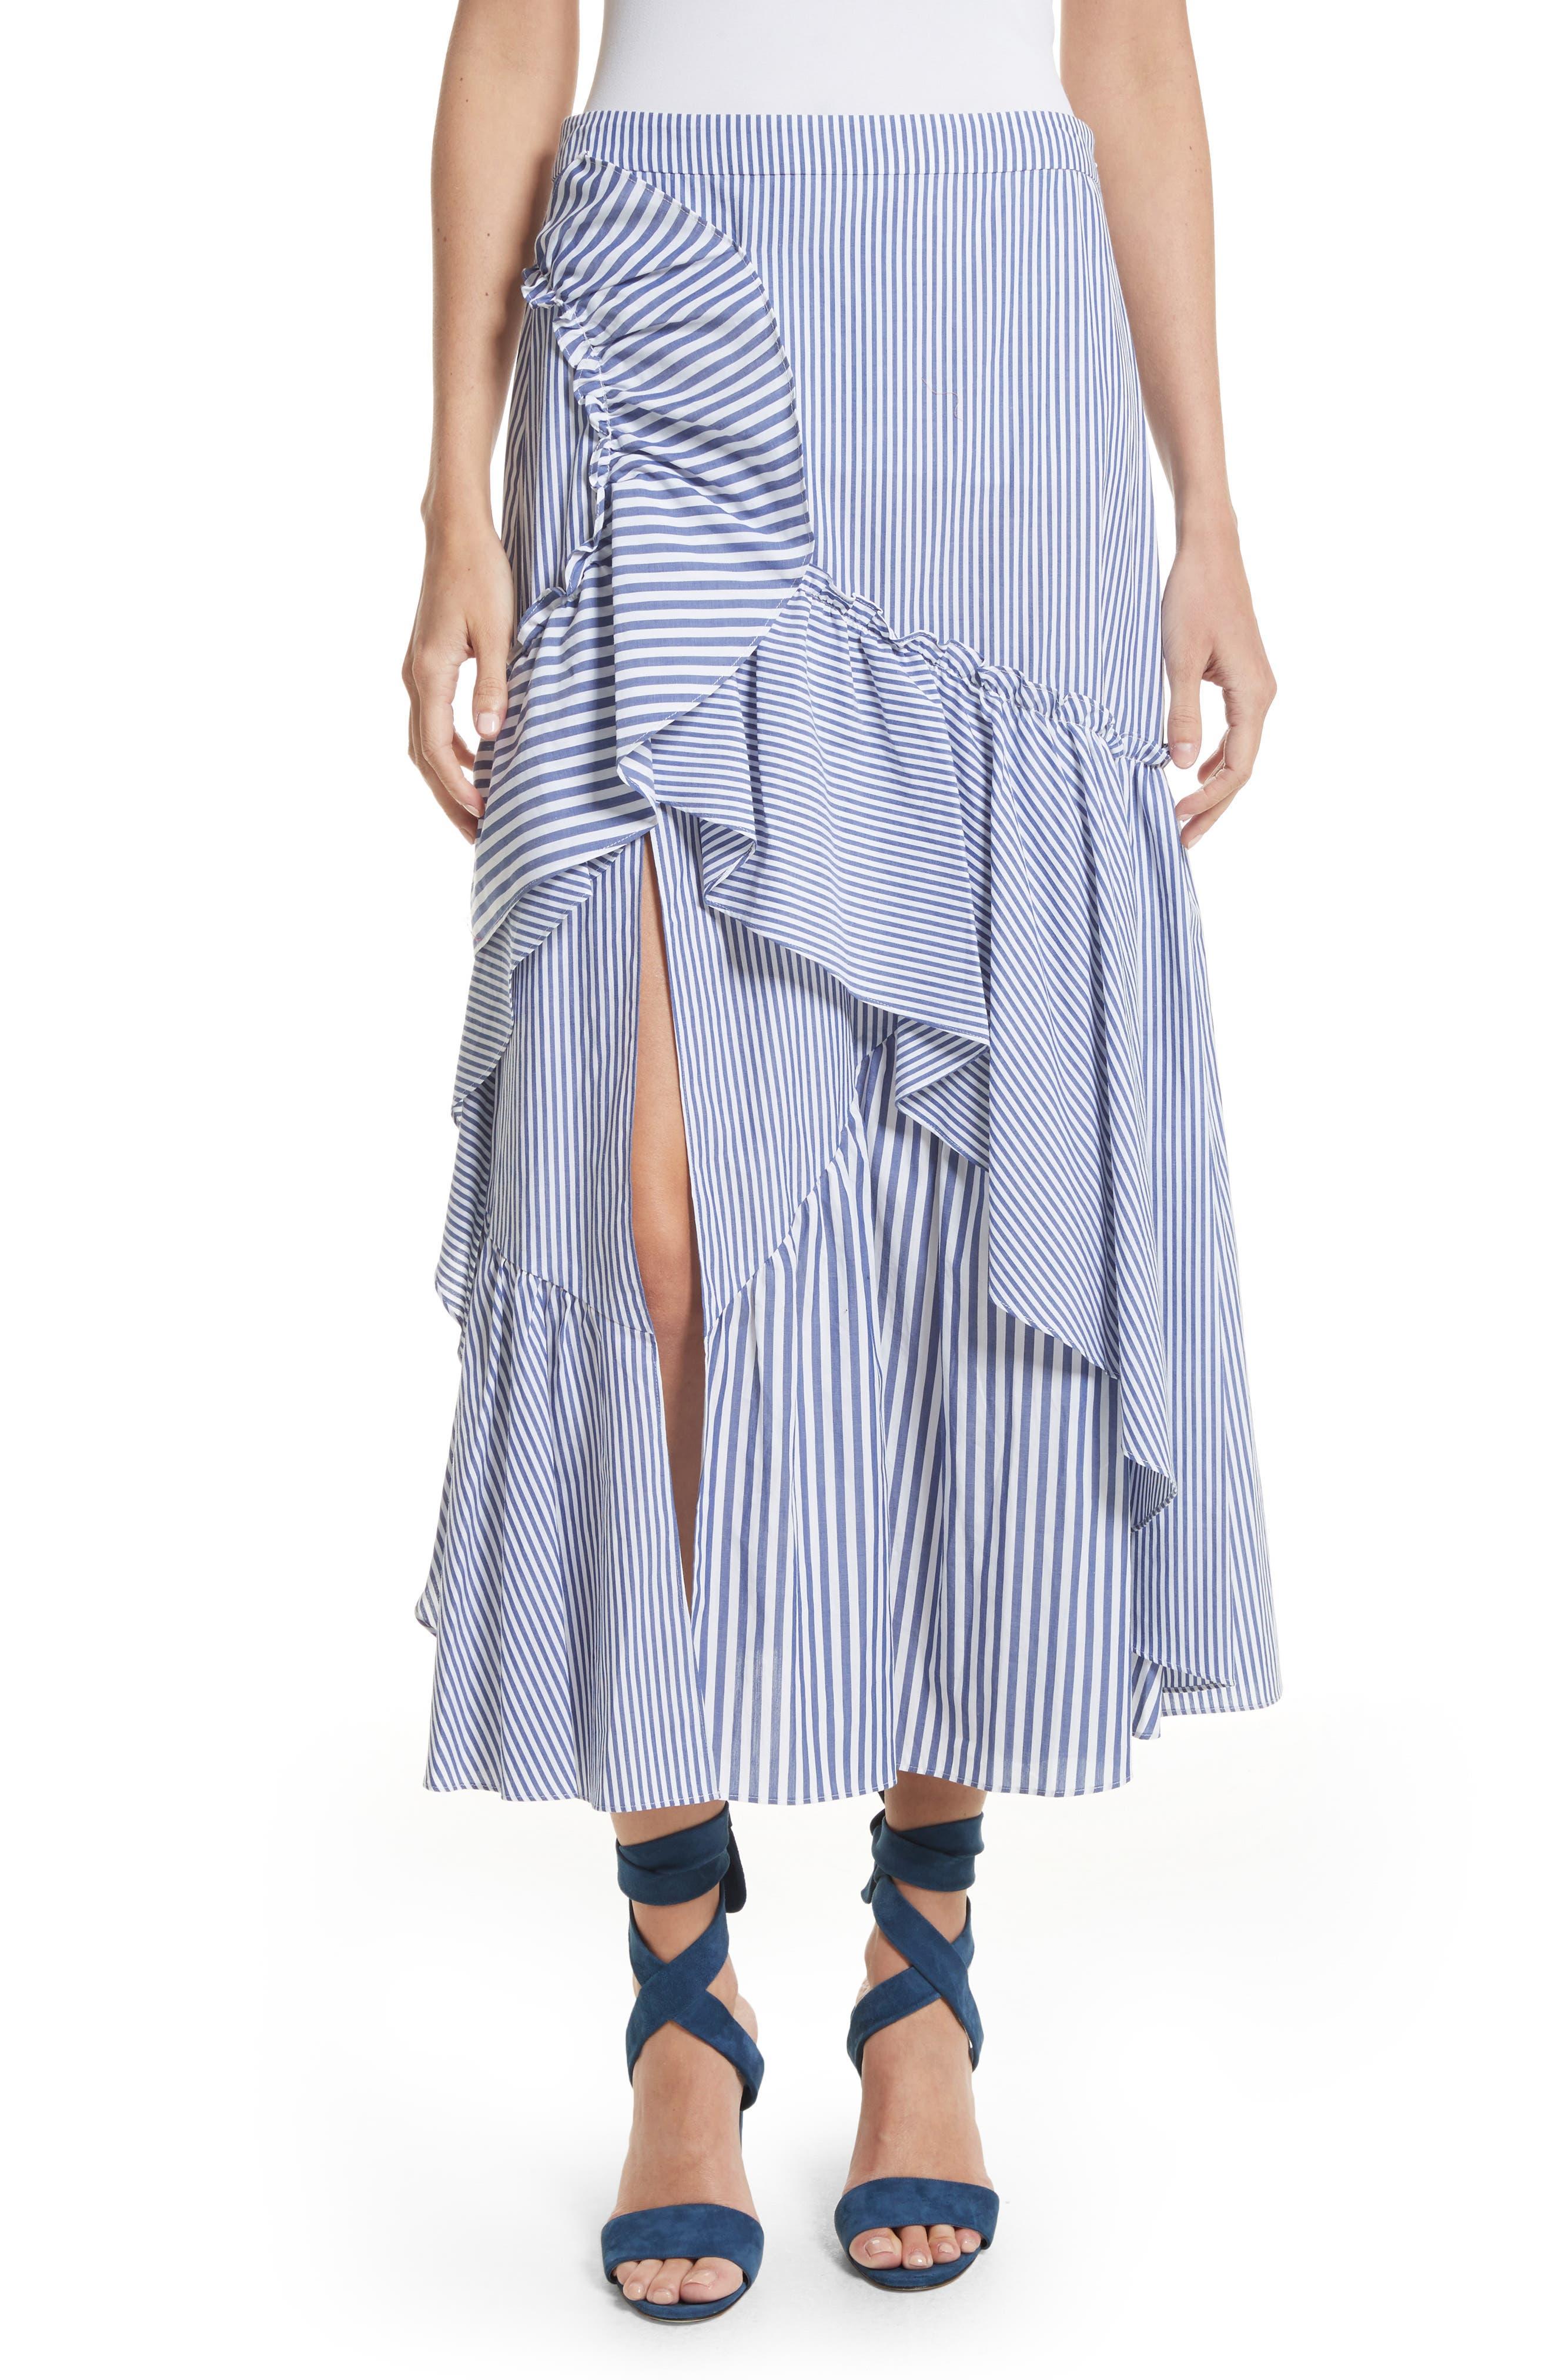 Tanya Taylor Jules Menswear Stripe Skirt